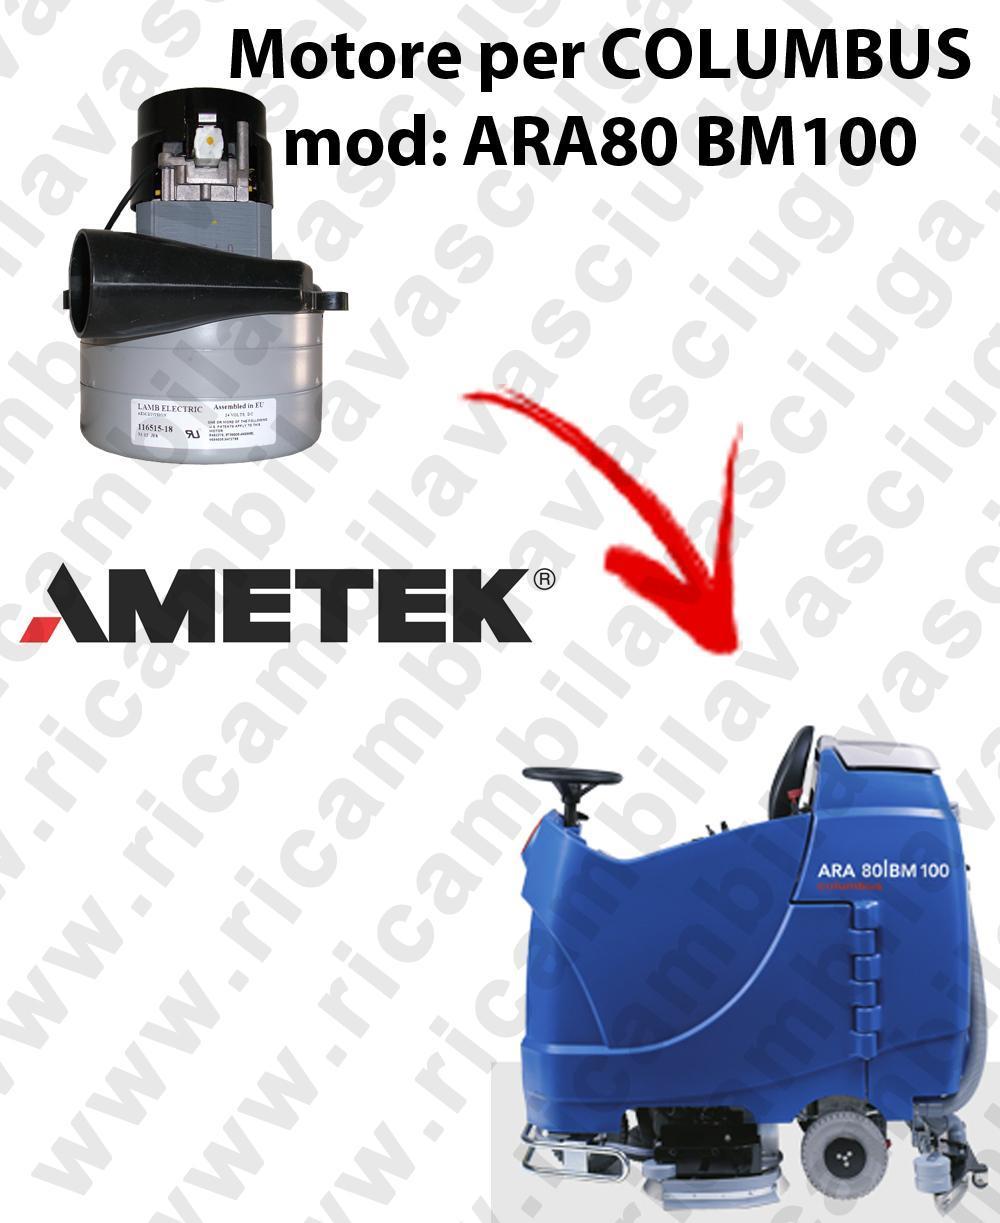 ARA80 BM100 Saugmotor LAMB AMETEK für scheuersaugmaschinen COLUMBUS